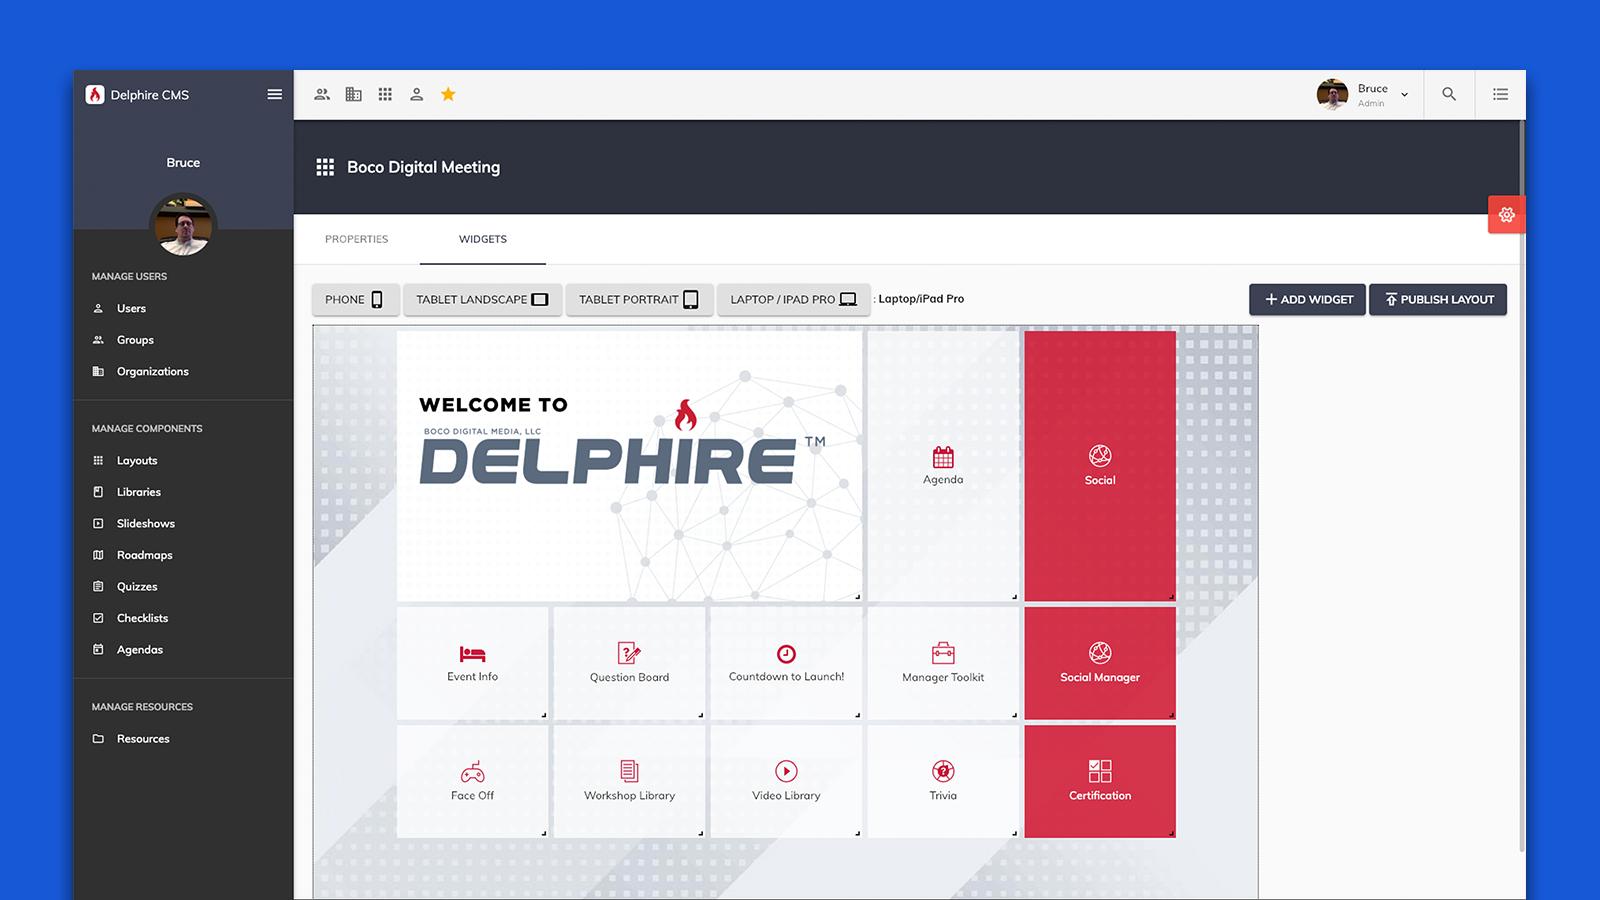 delphire5-16x9update.png